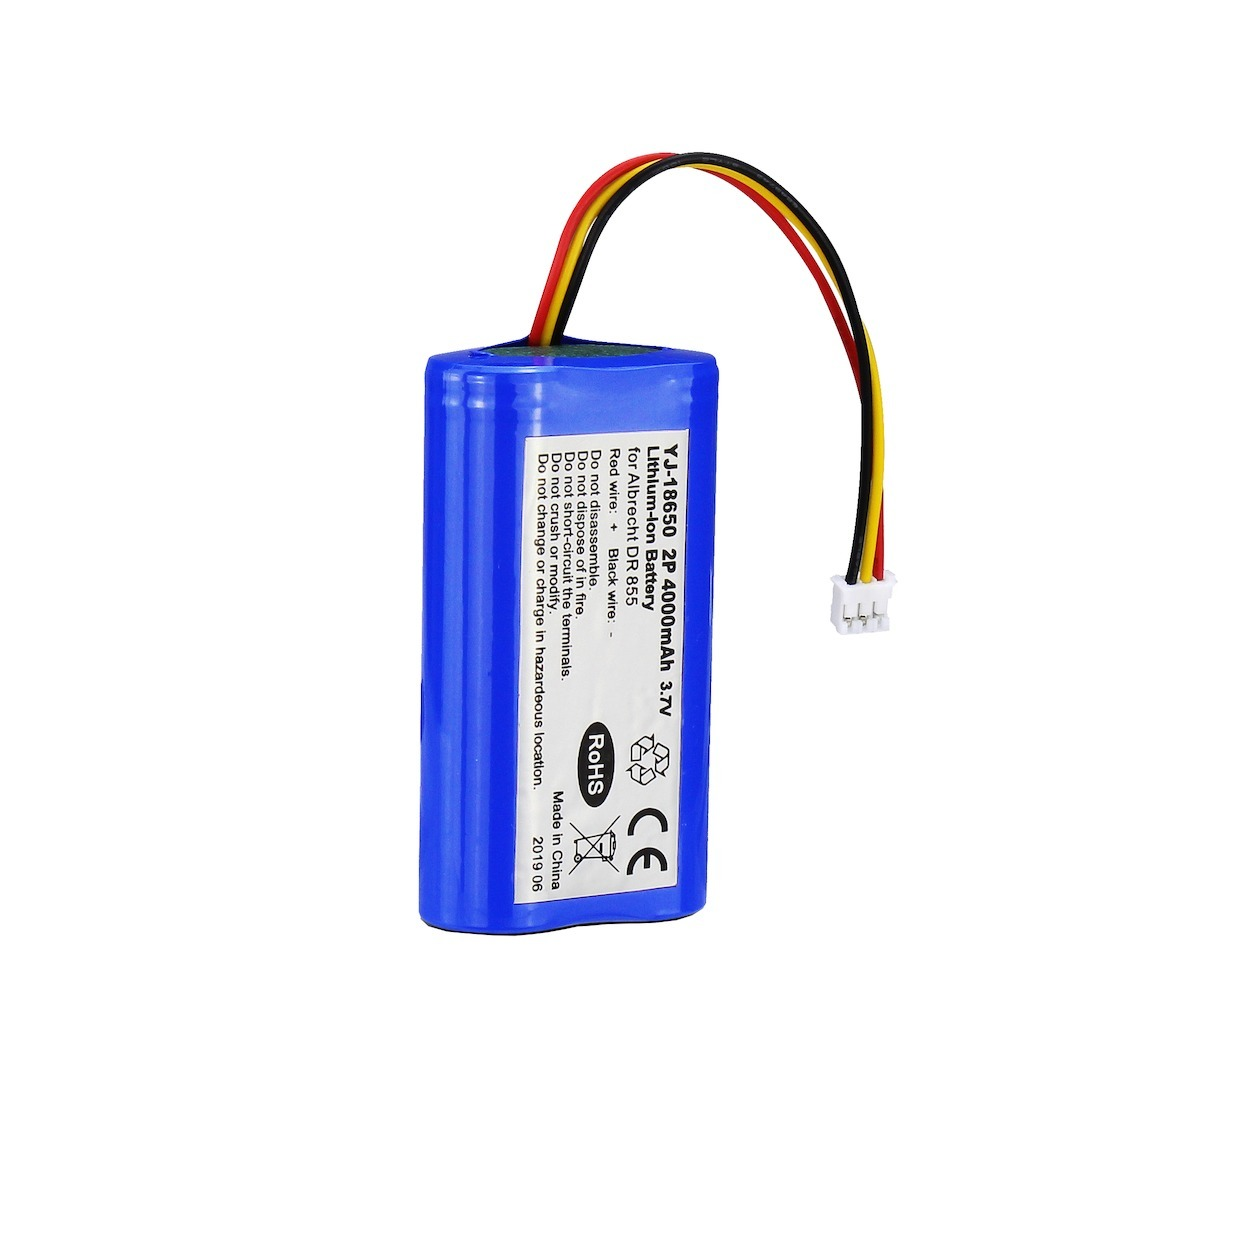 Korting Albrecht battery pack for DR855 DR860 batterij